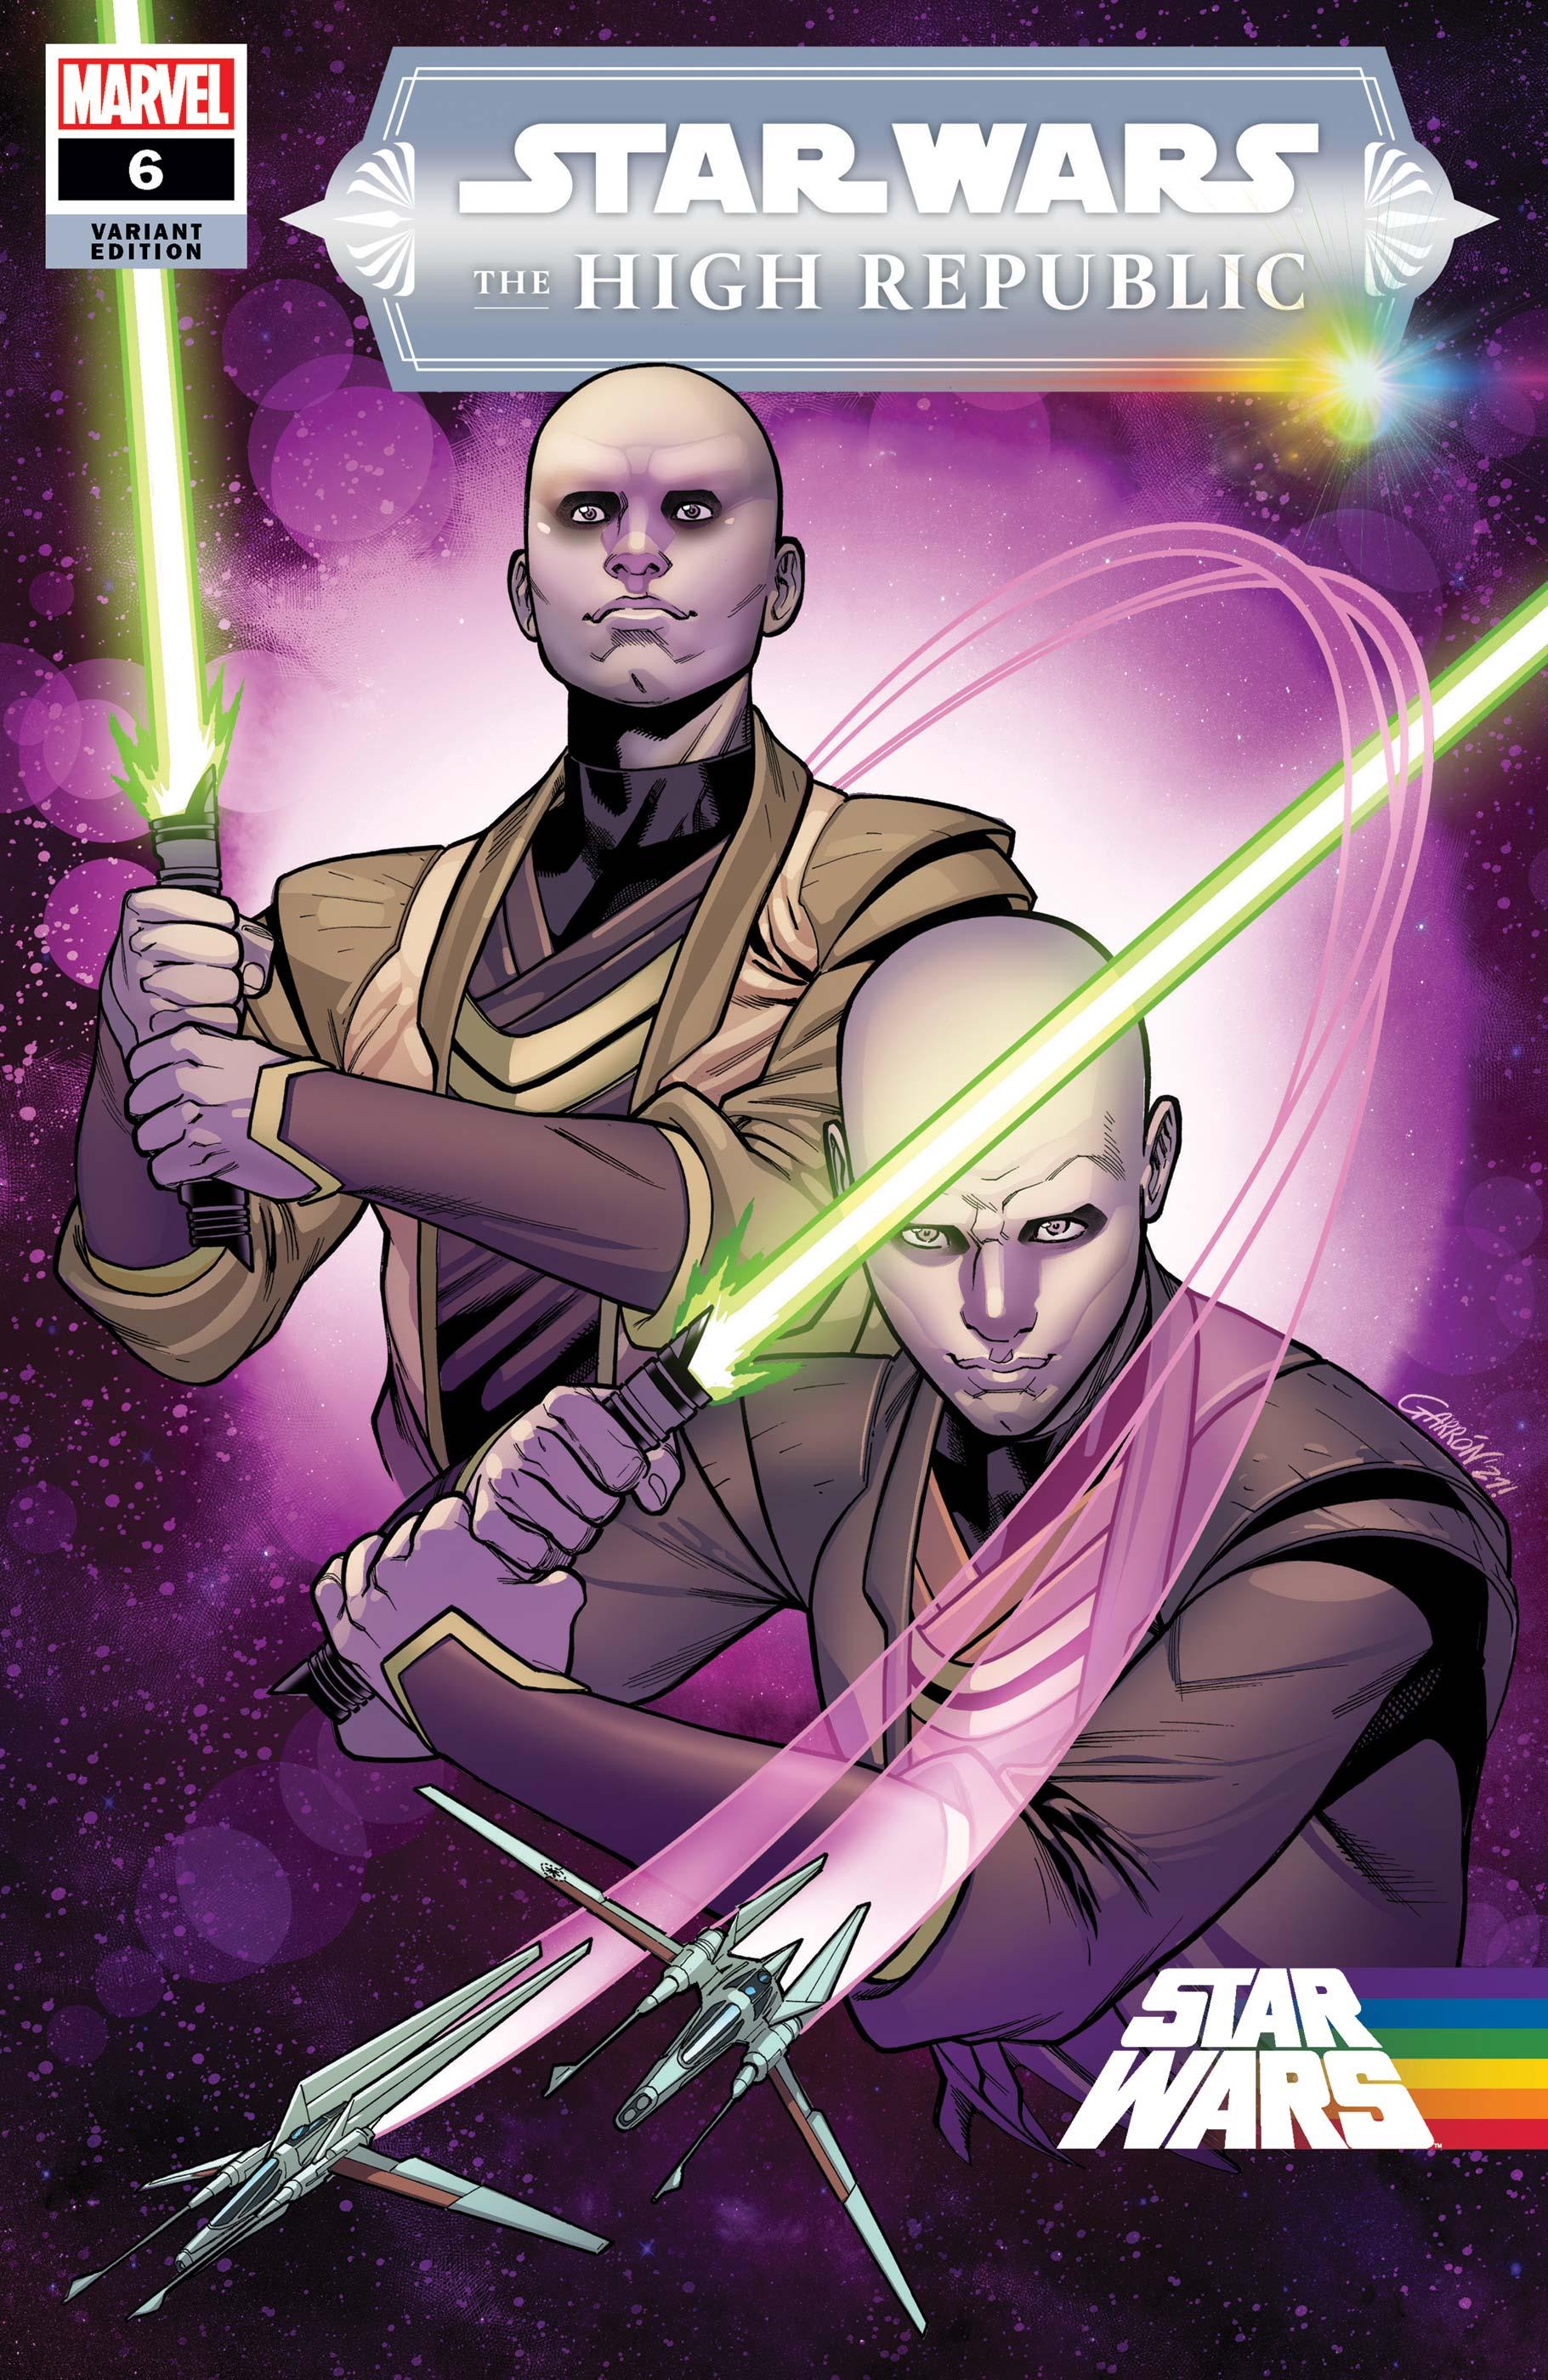 Star Wars: The High Republic (2021) #6 (Variant)